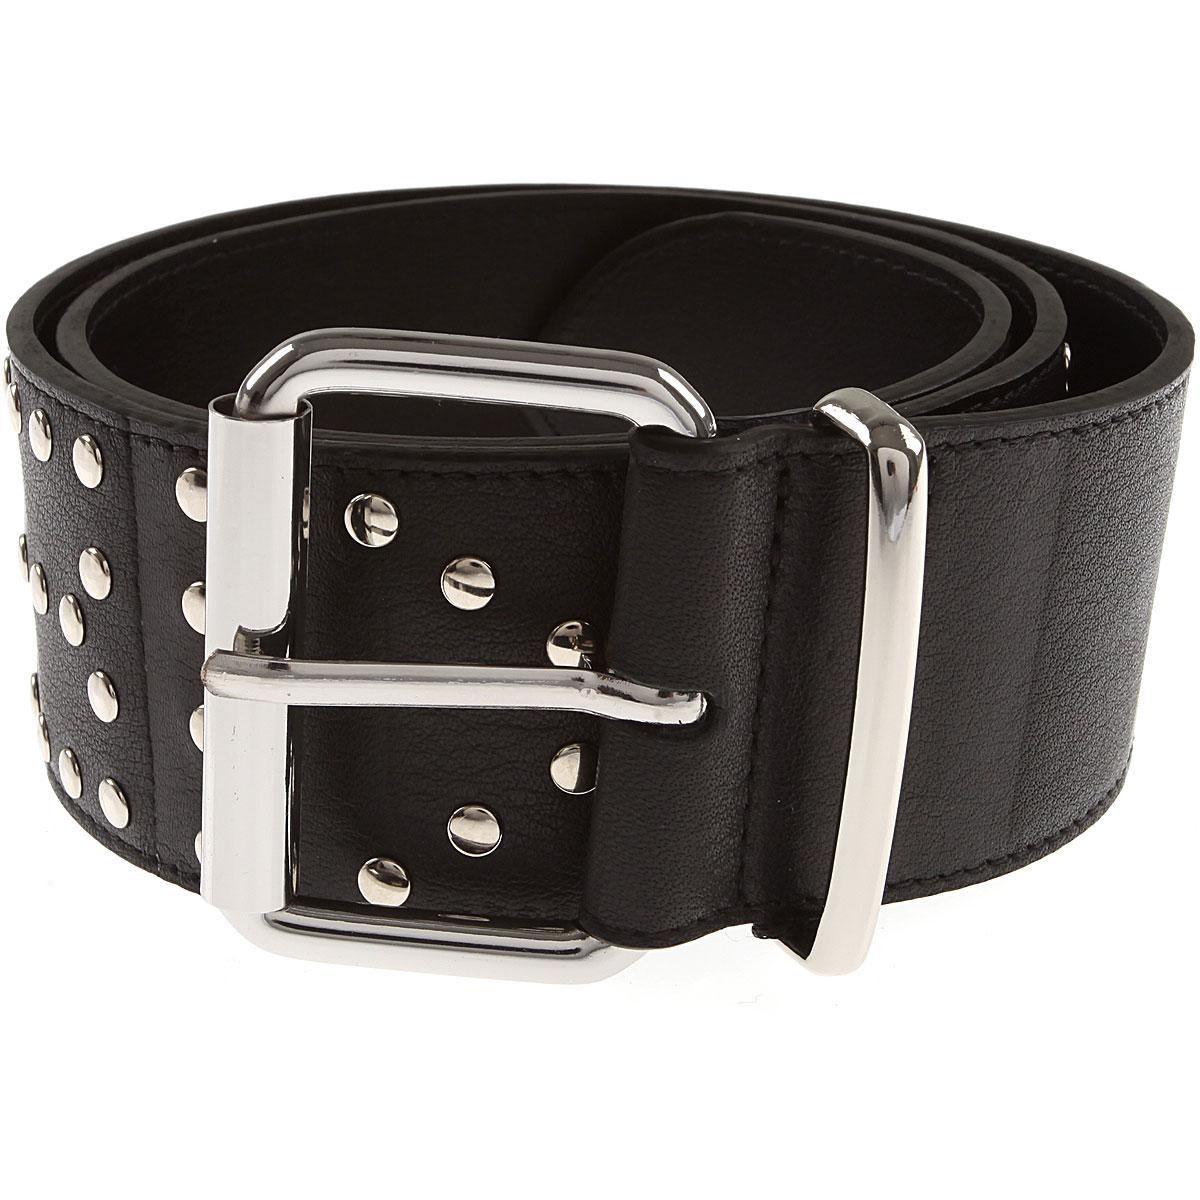 Image of Sonia Rykiel Belt for Women, Black, Leather, 2017